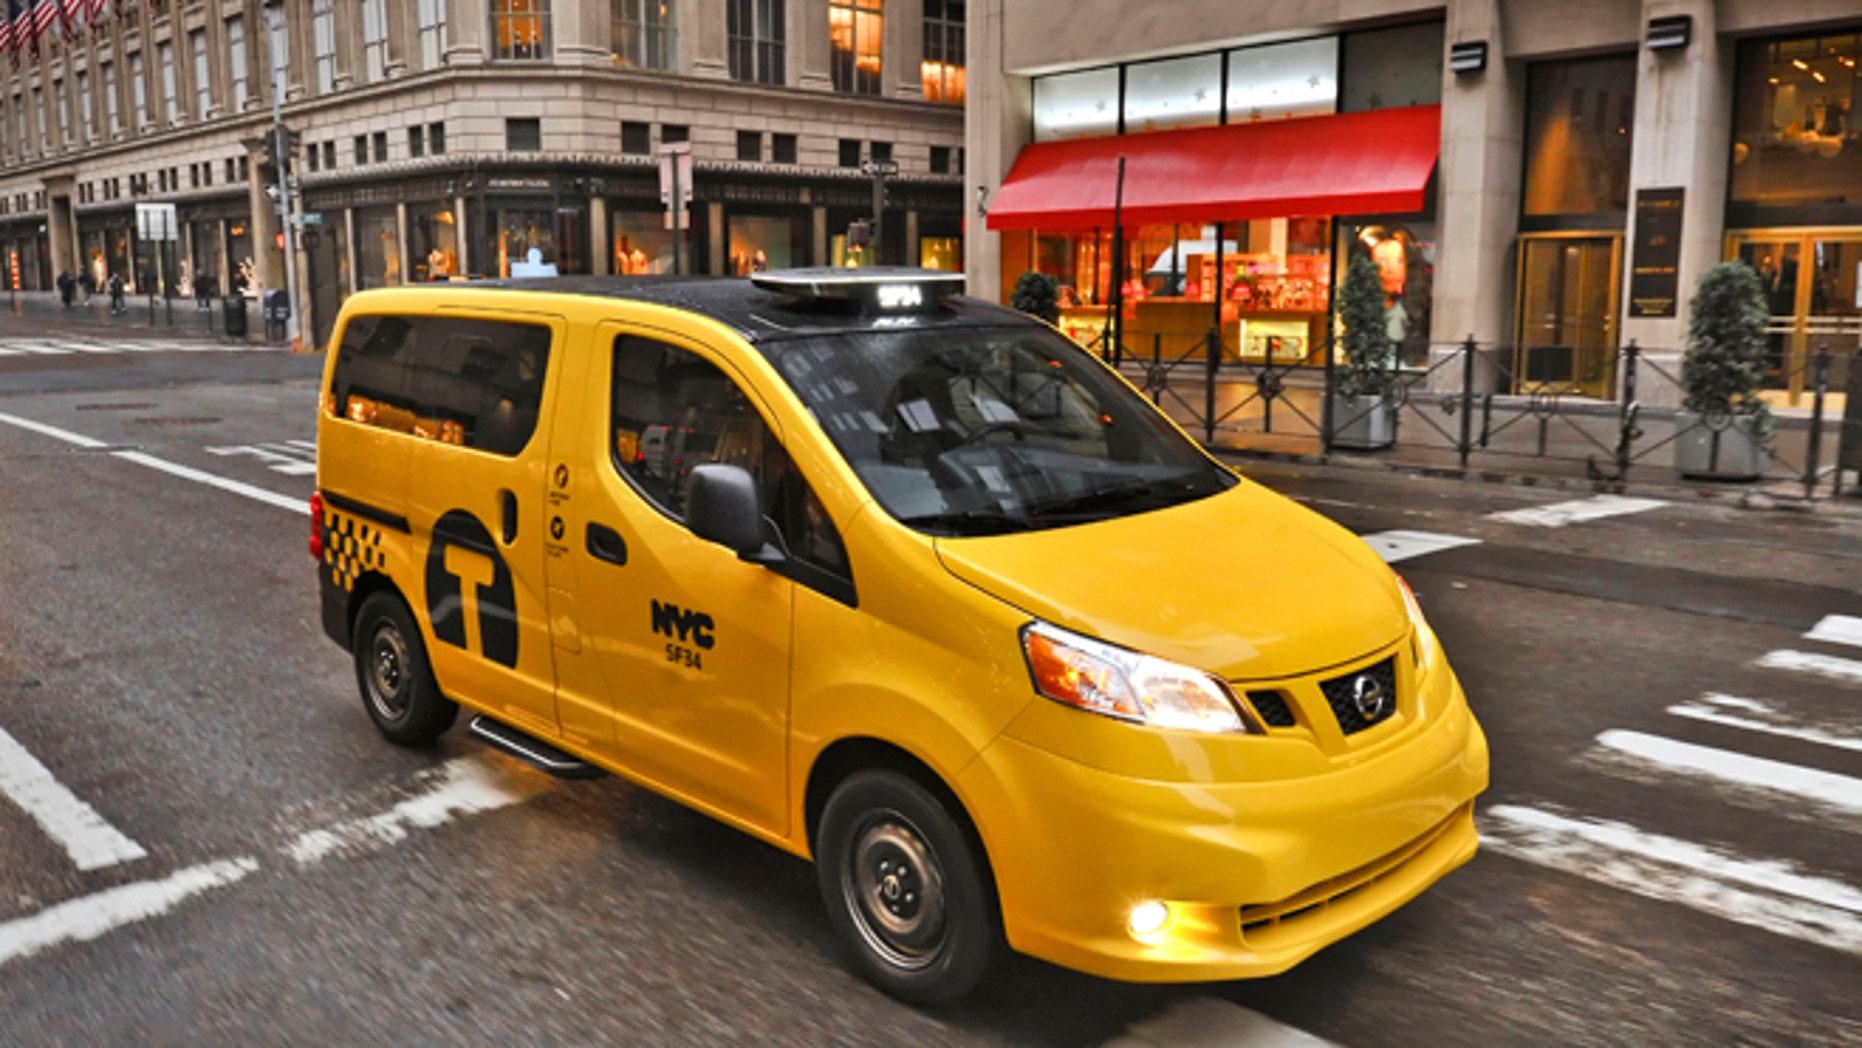 Critics seek to pump brakes on New York City's 'Taxi of Tomorrow